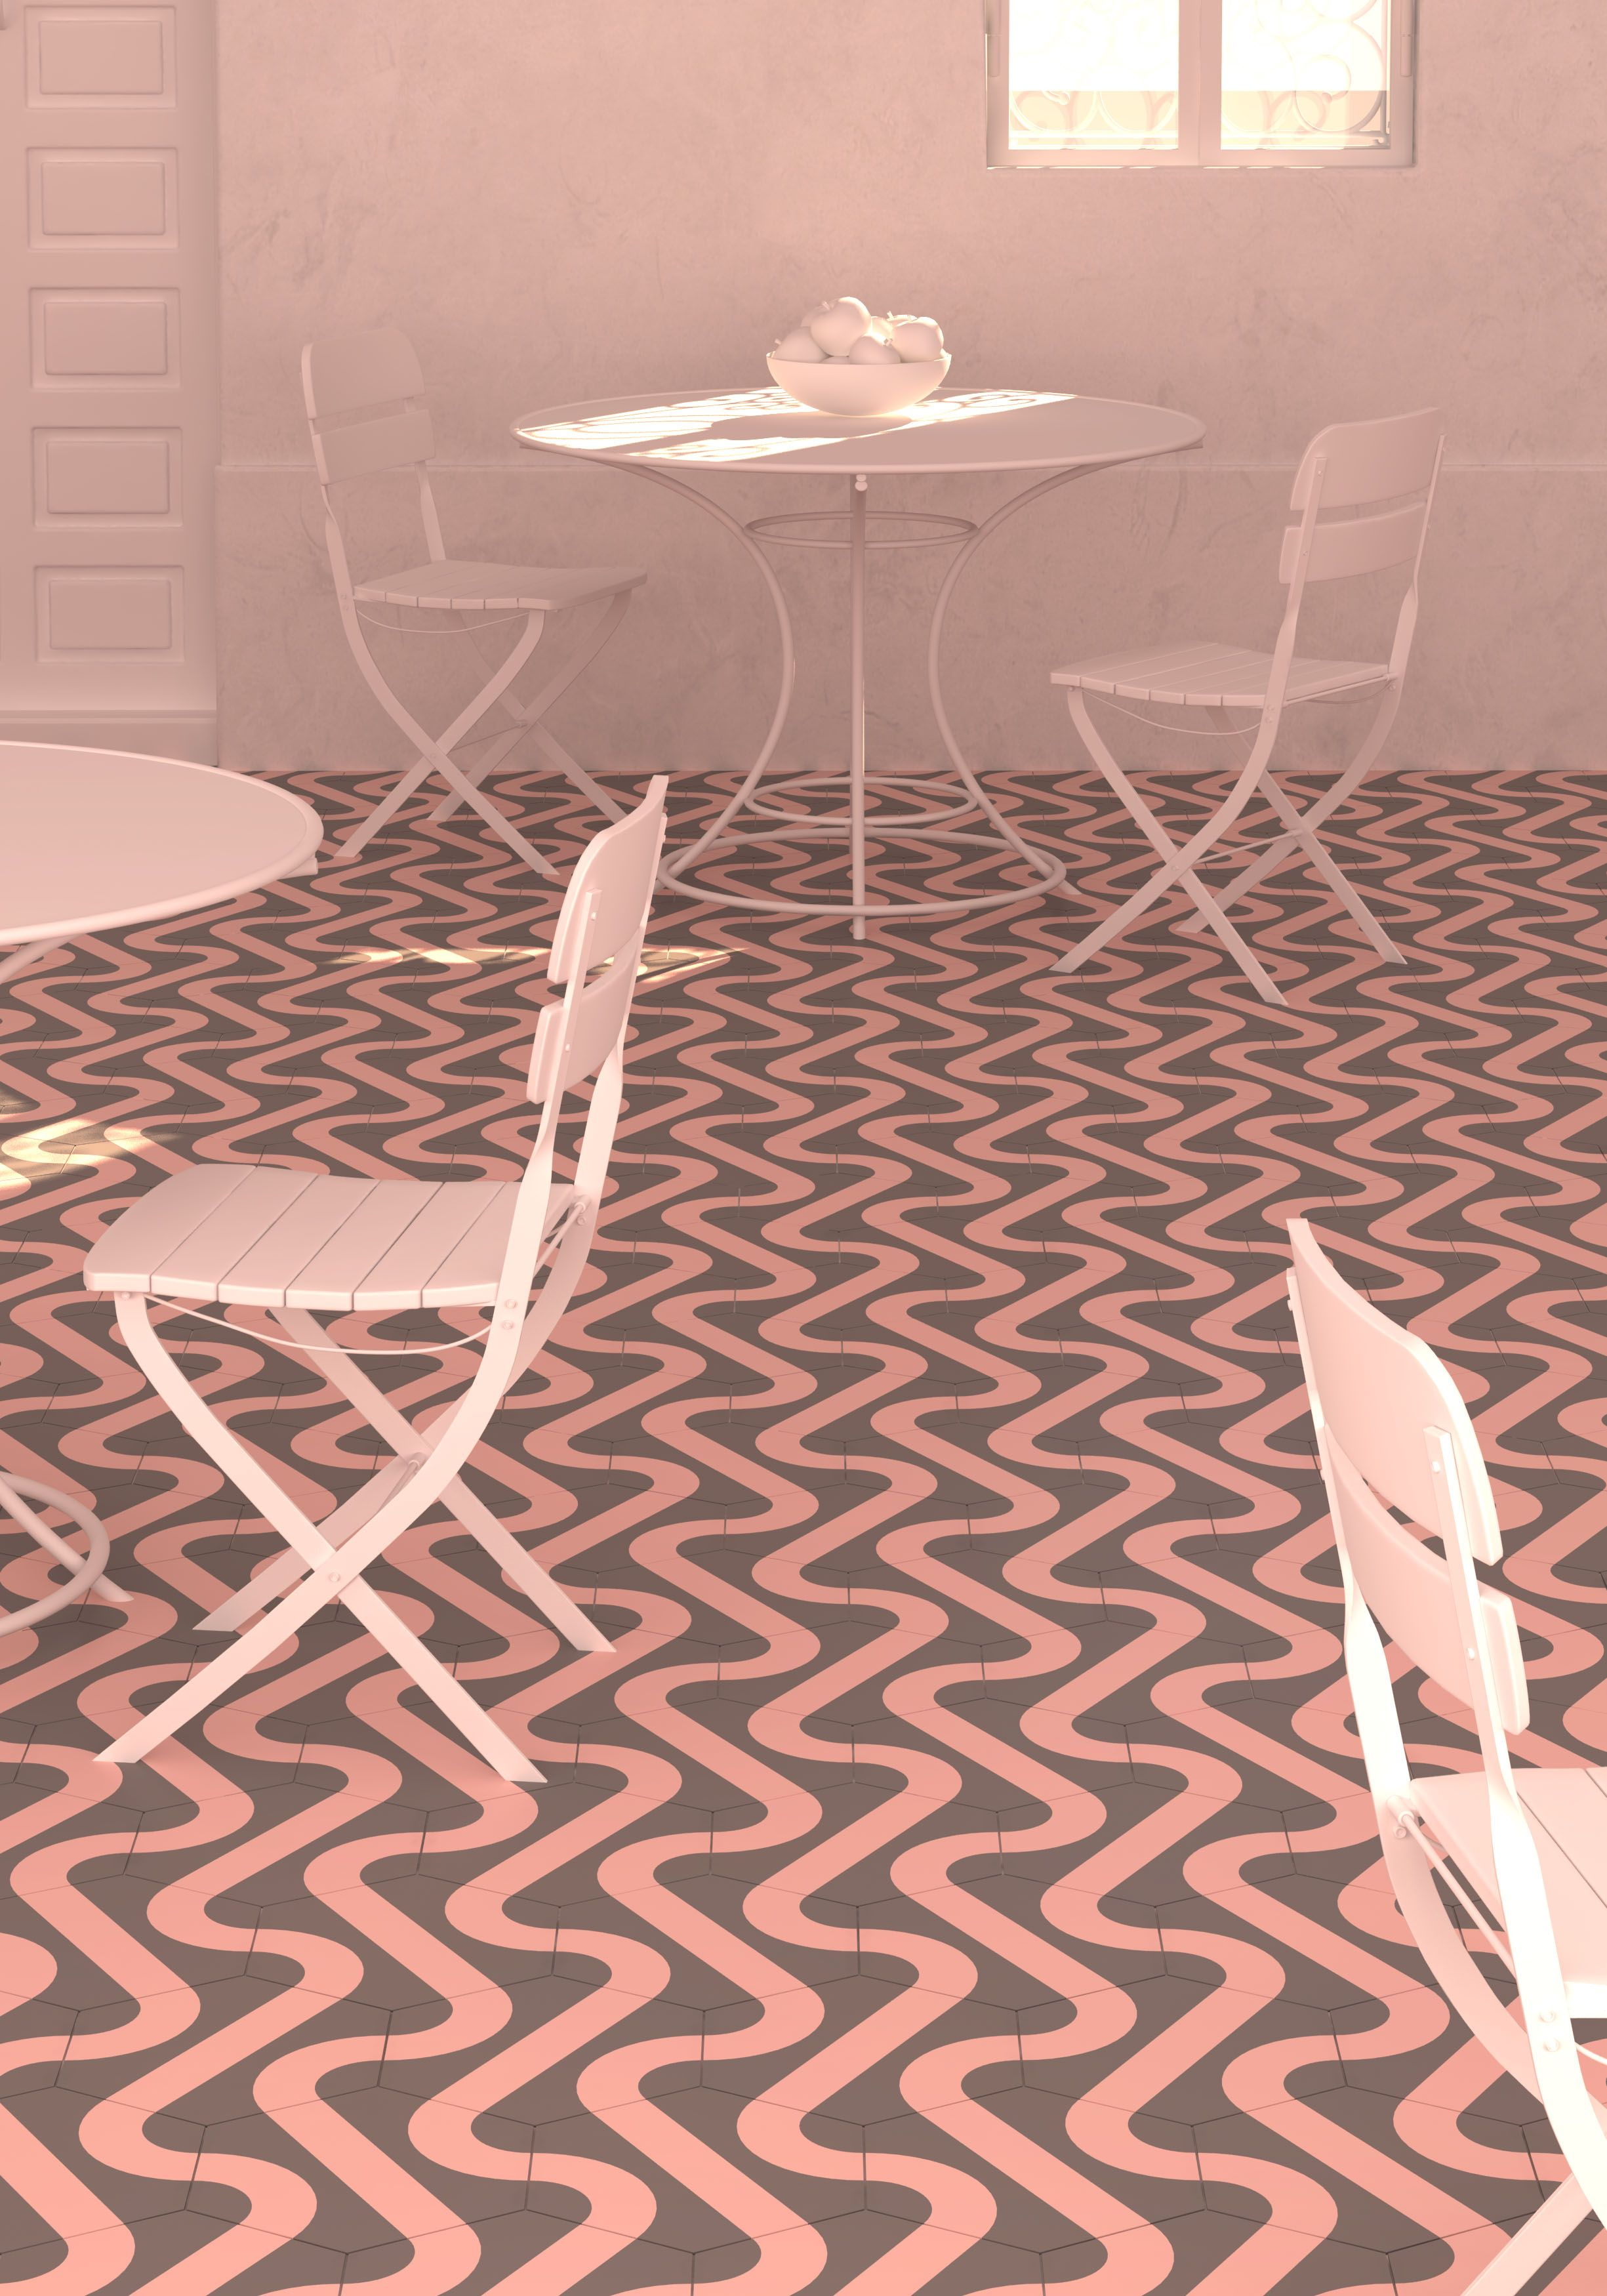 Roll by dsignio harmony floor tiles hexagon tiles roll by dsignio harmony floor tiles hexagon tiles encaustic cement tile doublecrazyfo Images